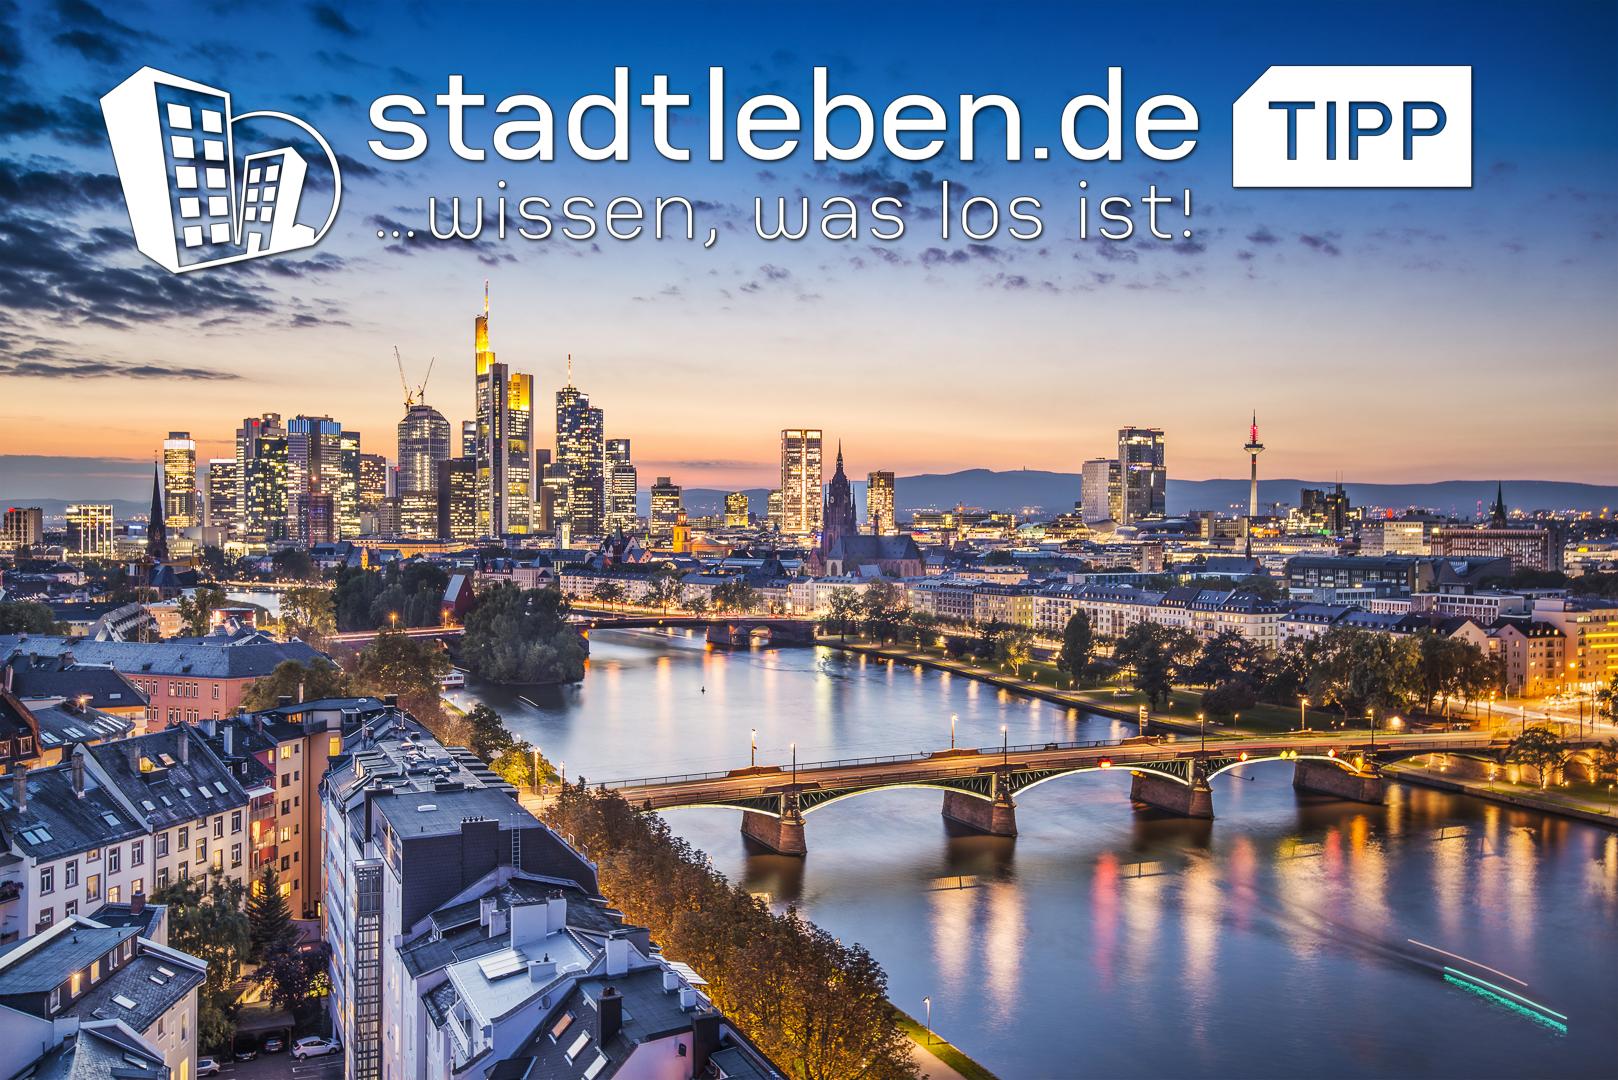 Skyline, Wasser, Main, Fluss, Gebäude, Frankfurt